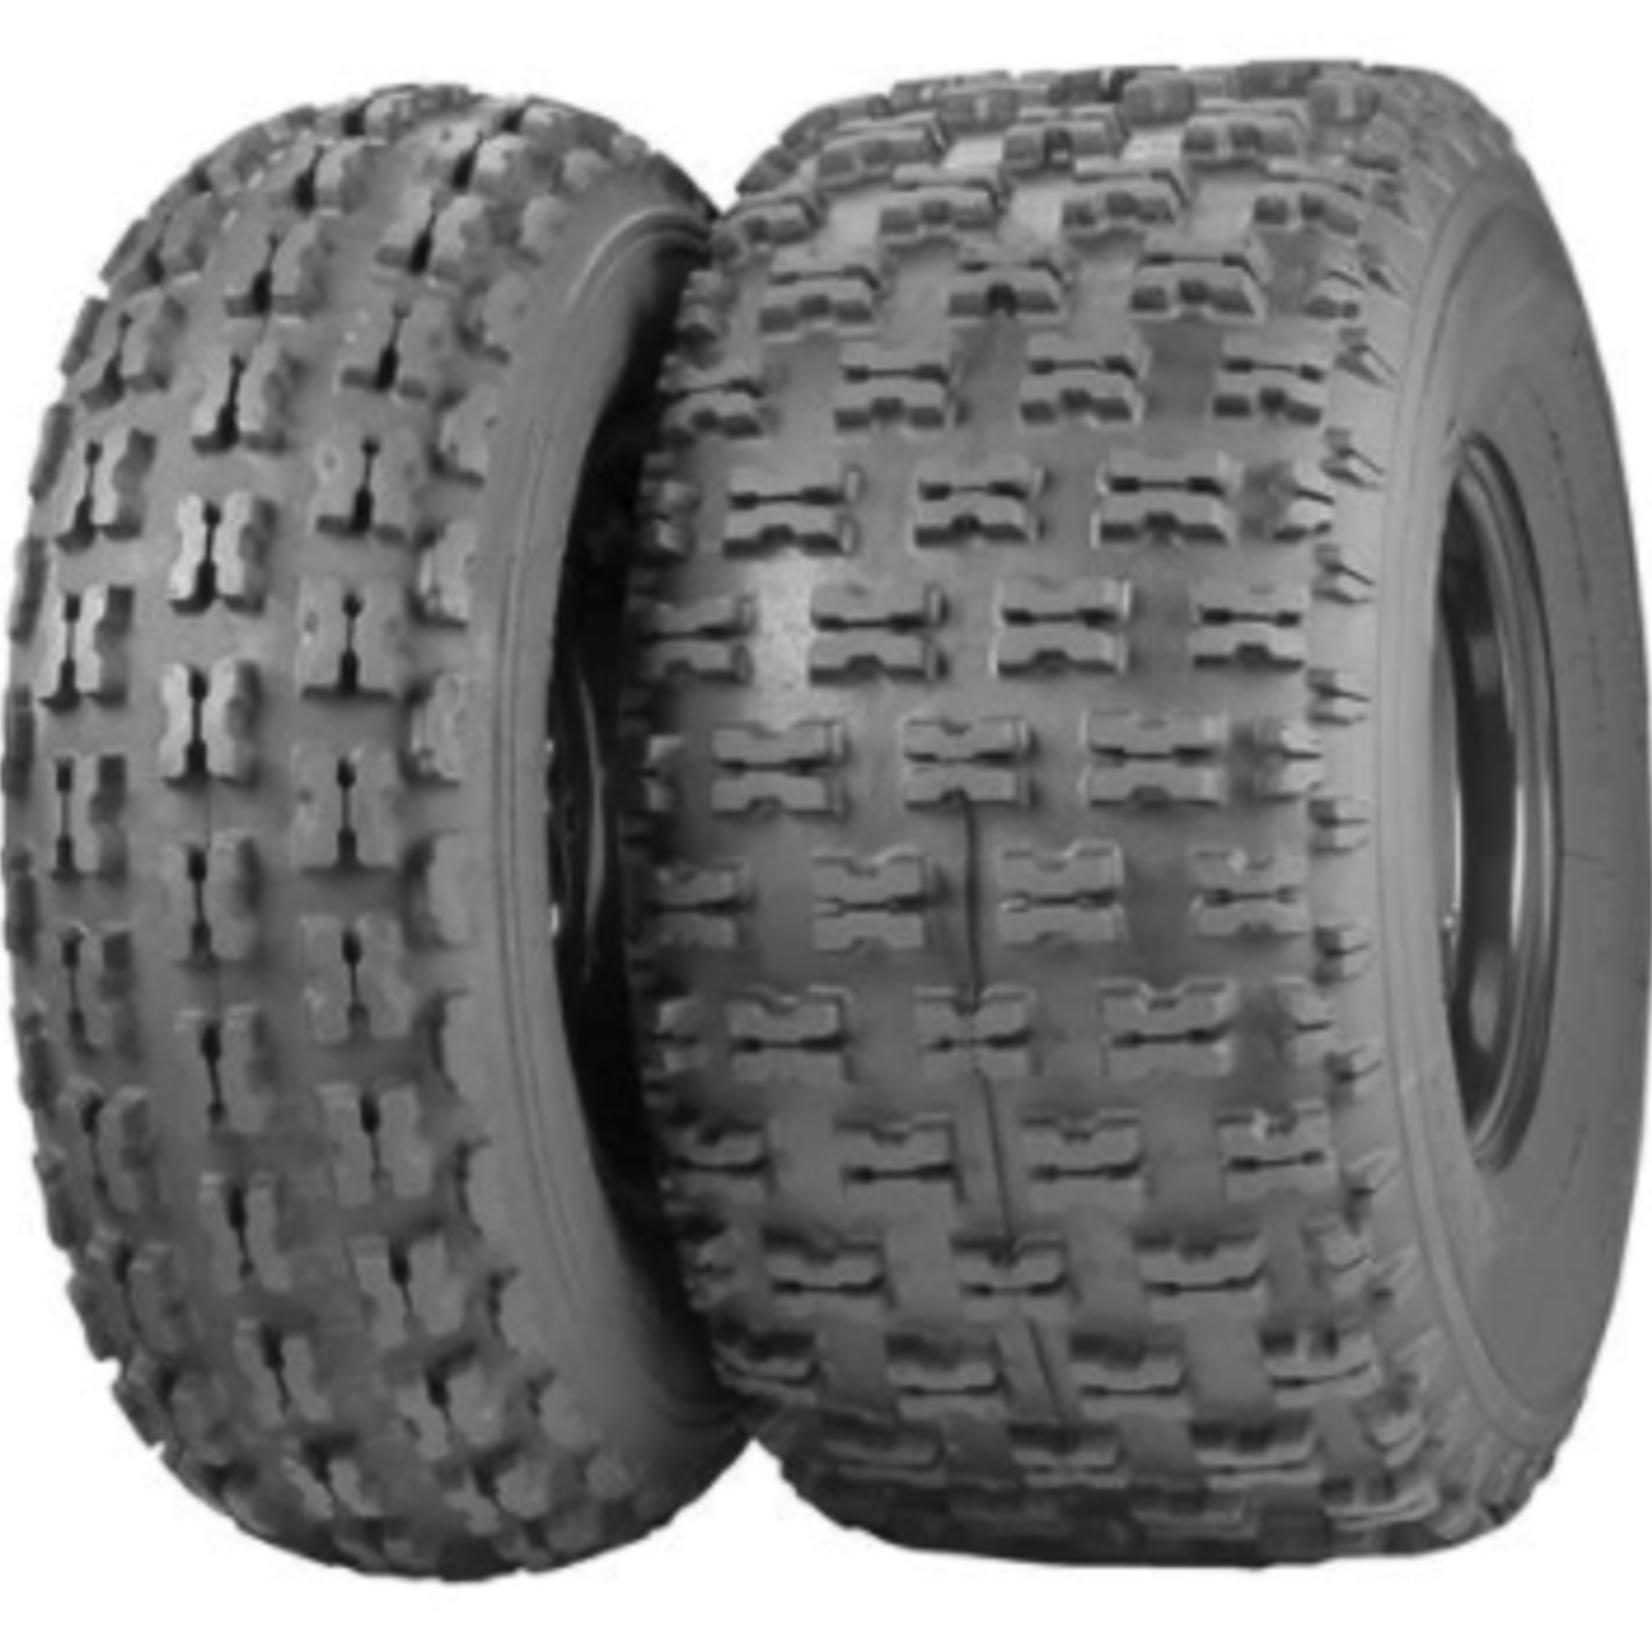 ITP ITP Stadium-Cross Holeshot SX Hard Terrain ATV Tire - Front - 20x6-10